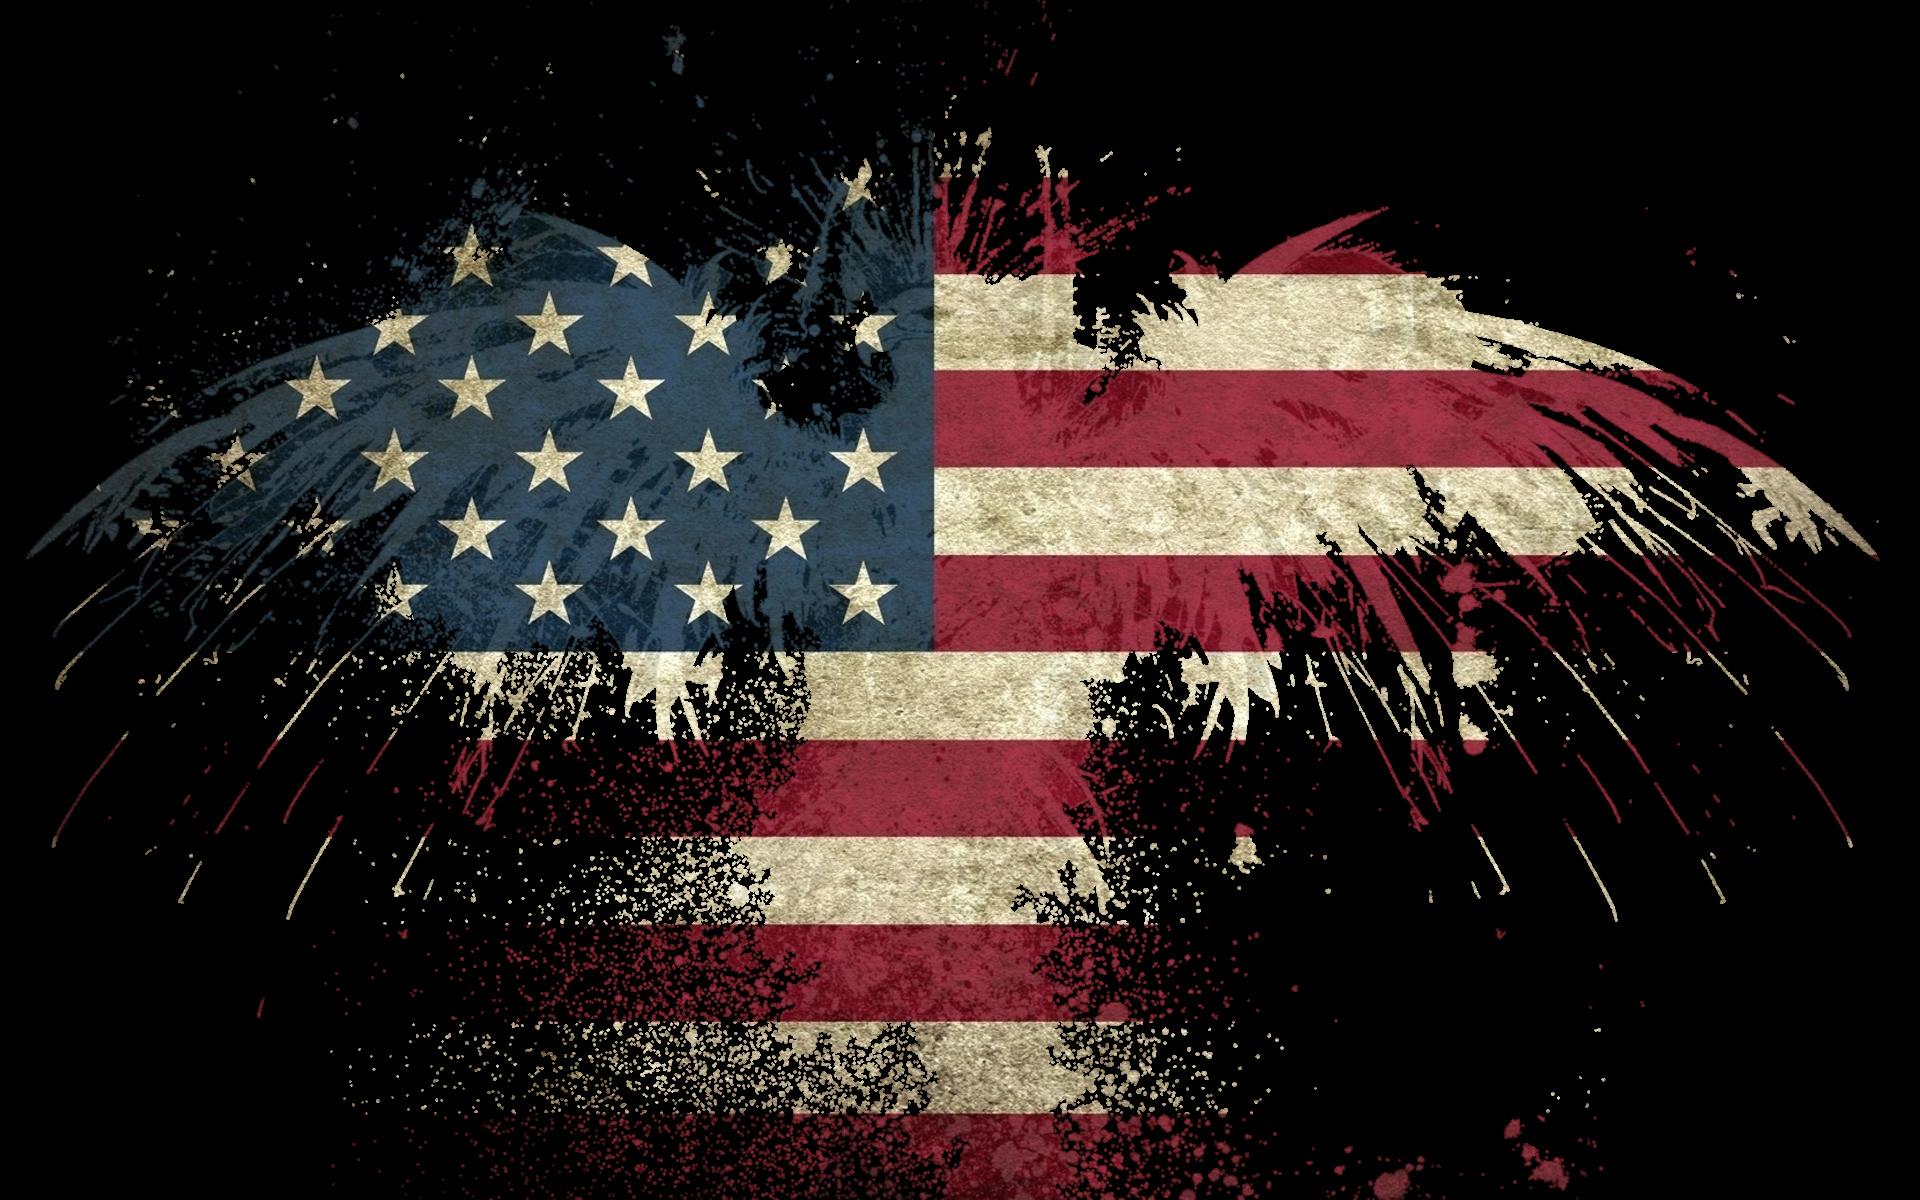 USA America flag eagle wallpaper 1920x1200 35800 WallpaperUP 1920x1200